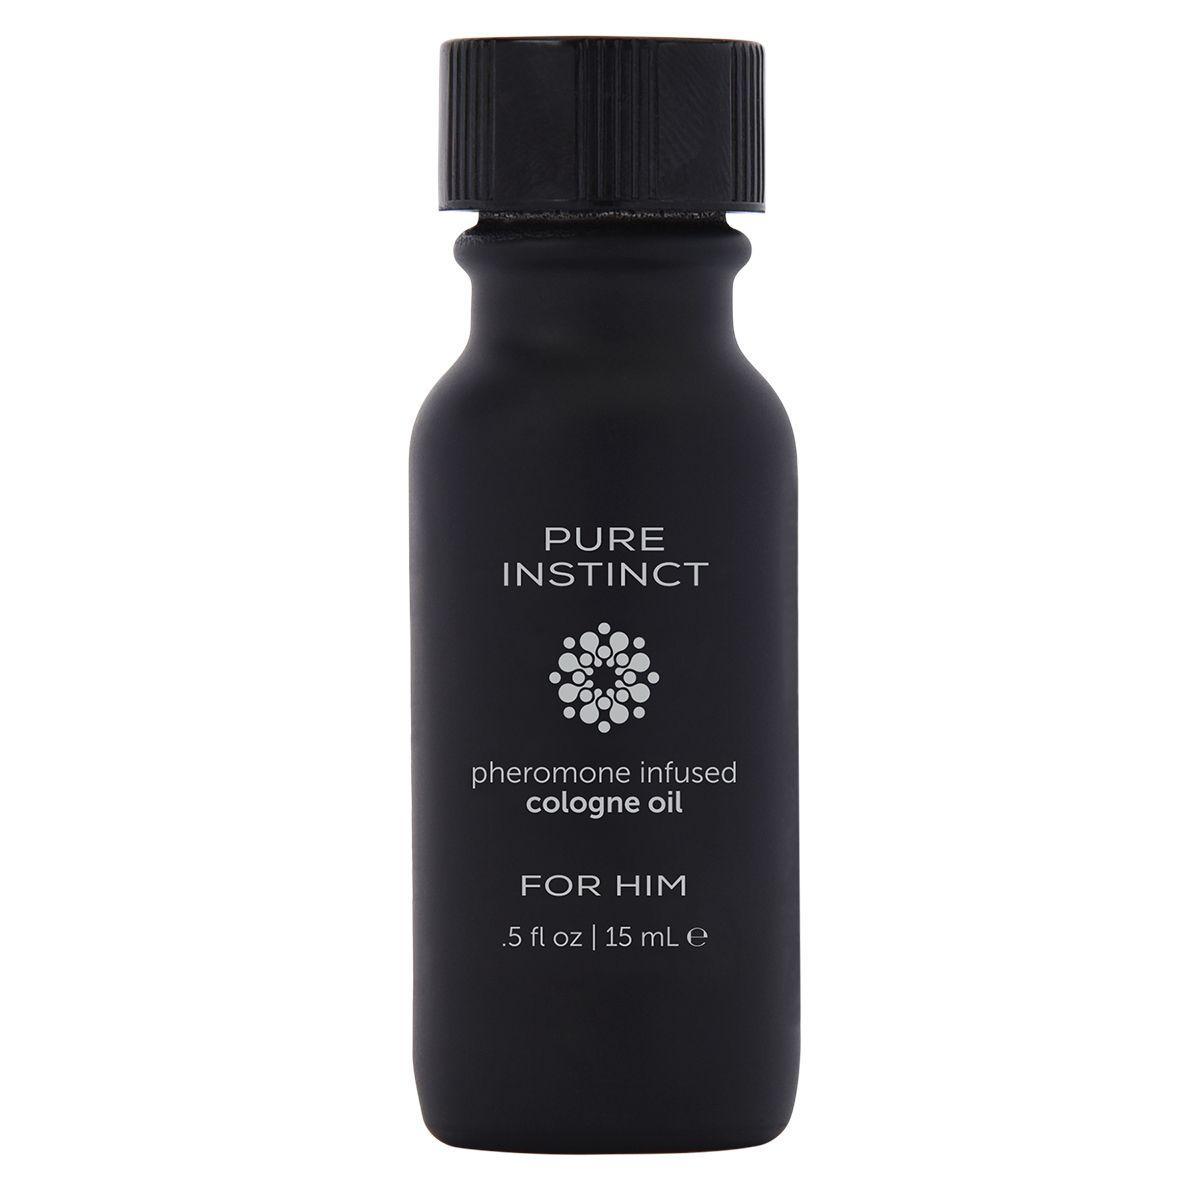 Мужское парфюмерное масло с феромонами PURE INSTINCT - 15 мл.-6614